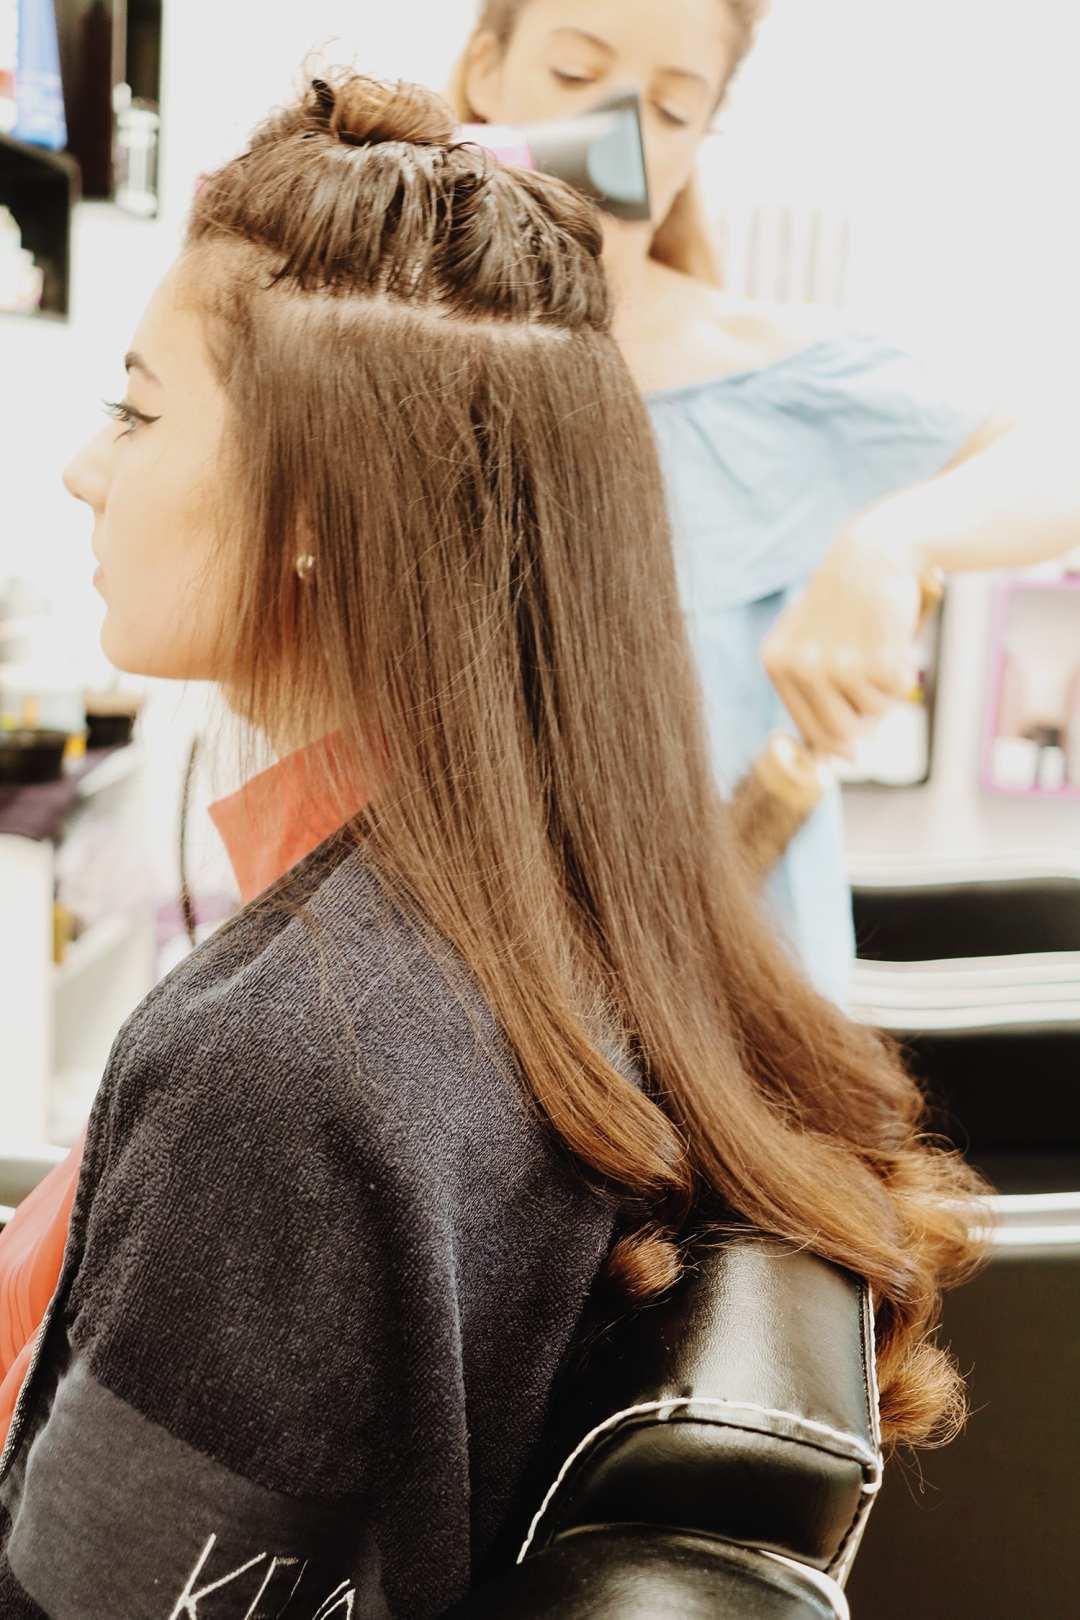 londa professional fiber infusion pret salon roxi rose tratament cheratina par cret efecte keratina pareri review beauty blog romania timisoara fashion lstudio timisoara laura jivan (50)